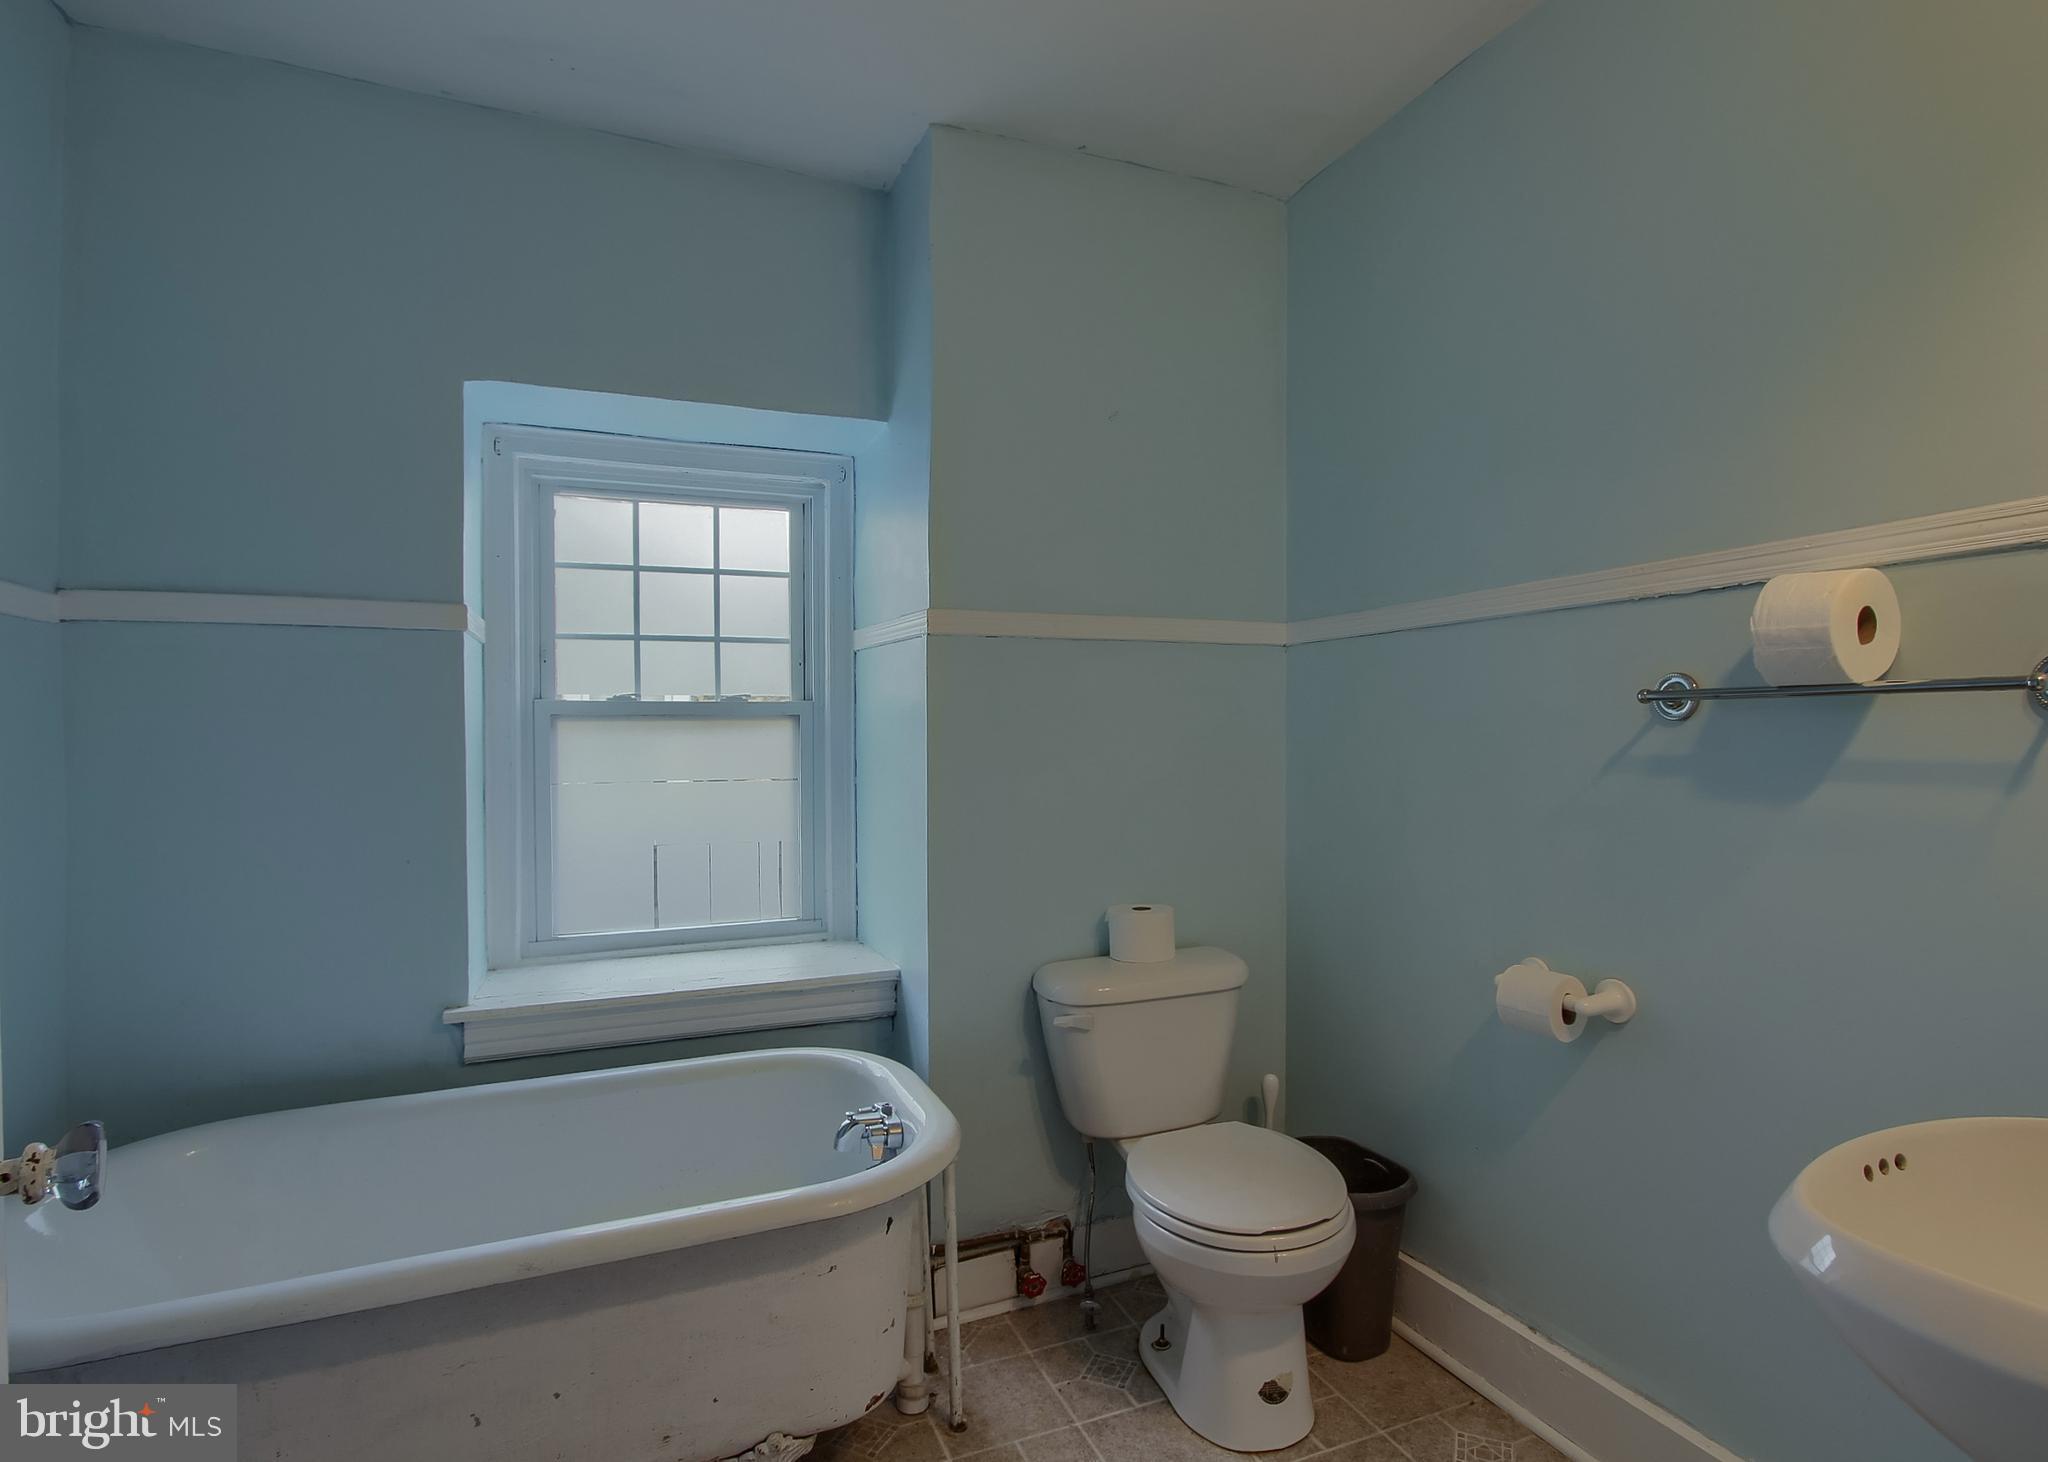 2nd full bathroom on 3rd floor